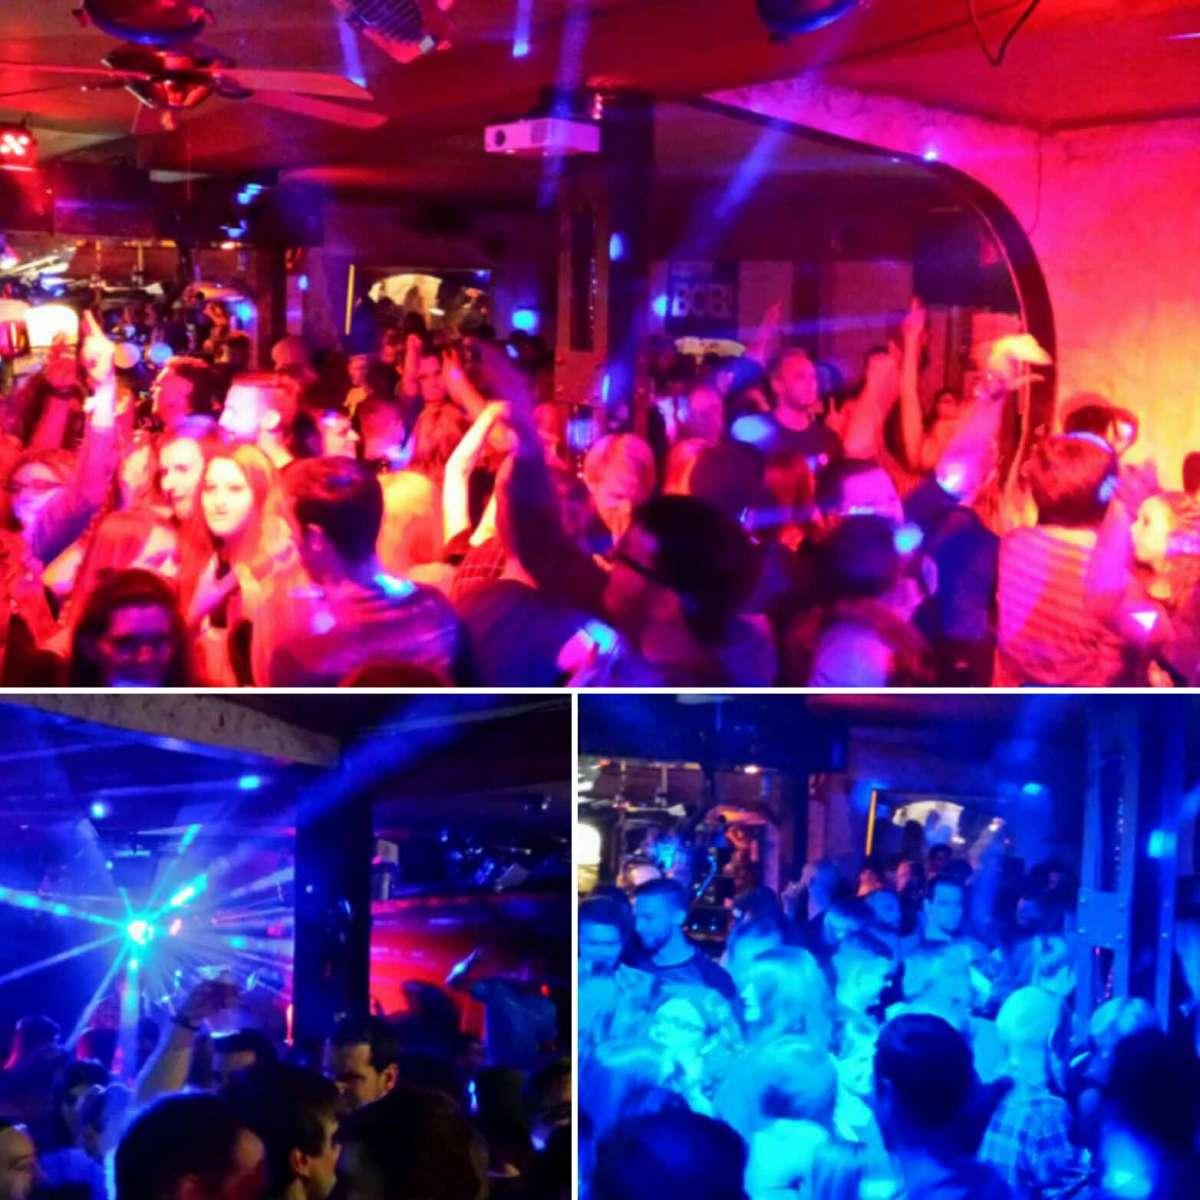 ABGESAGT! - Select Party #62 - DJ '59 Sound - Fiasko - Kassel